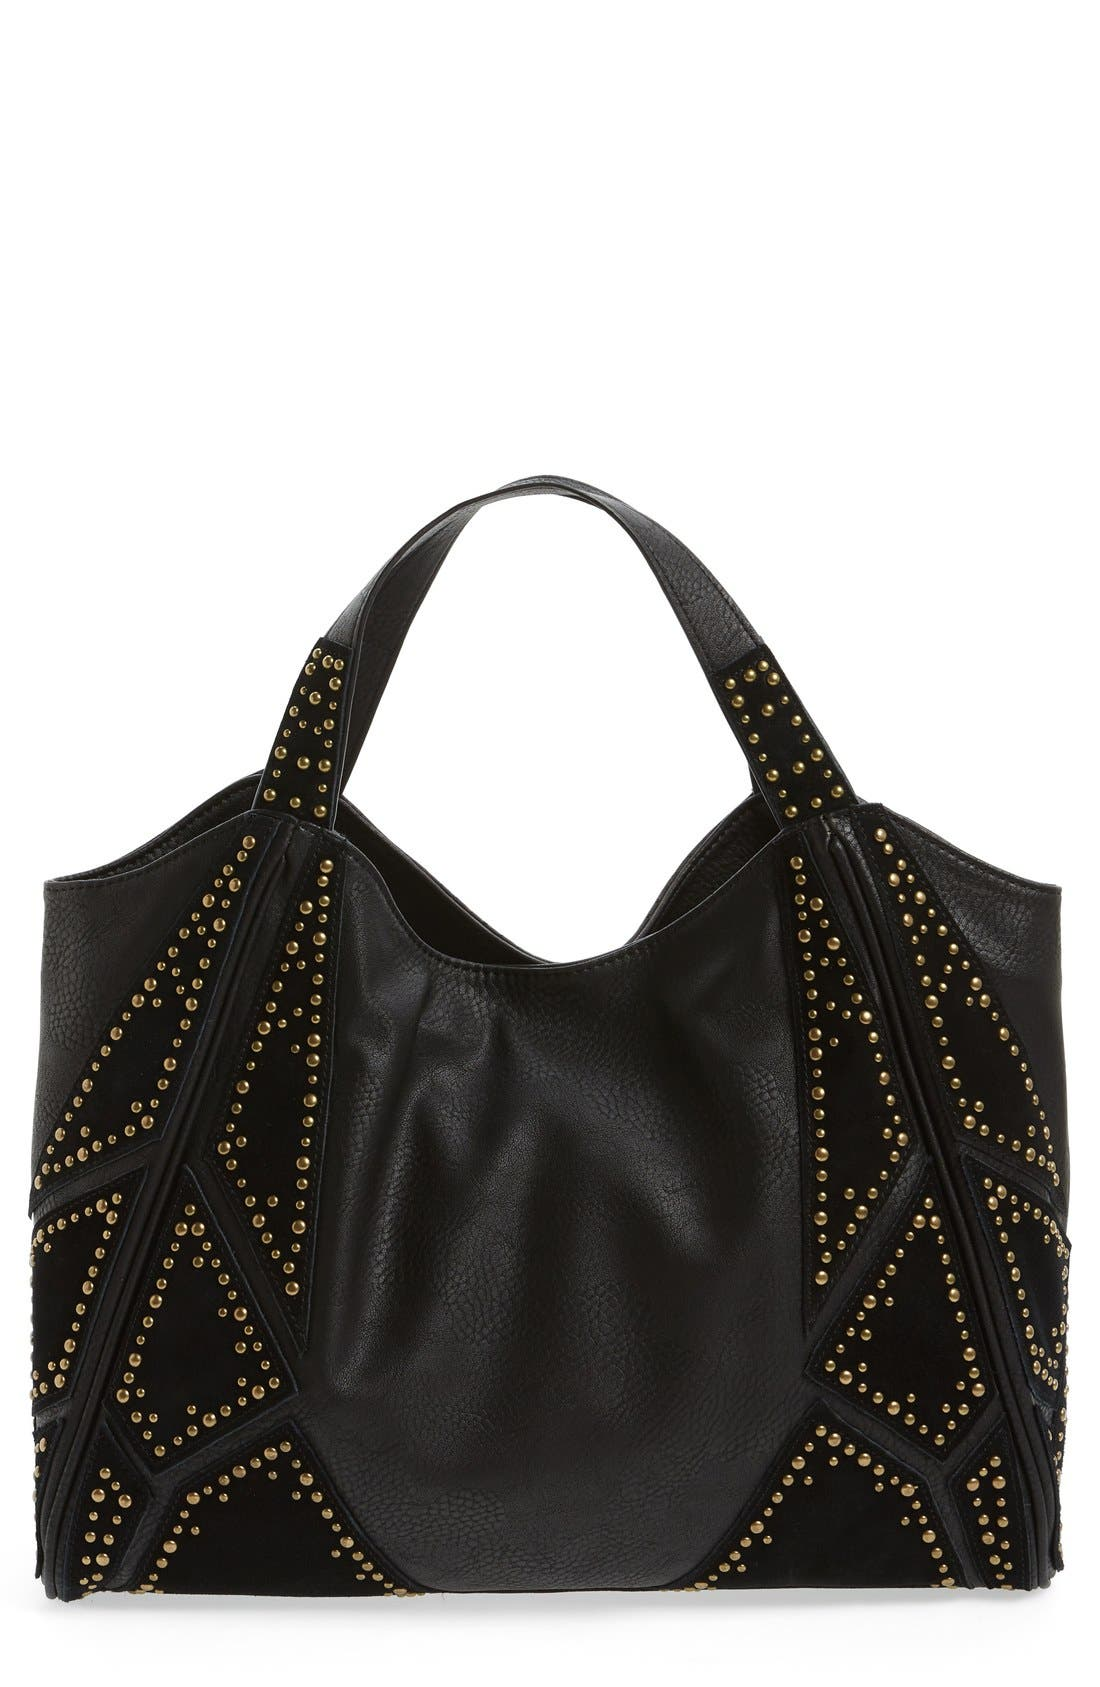 'Jlora' Studded Hobo Bag,                             Main thumbnail 1, color,                             Black